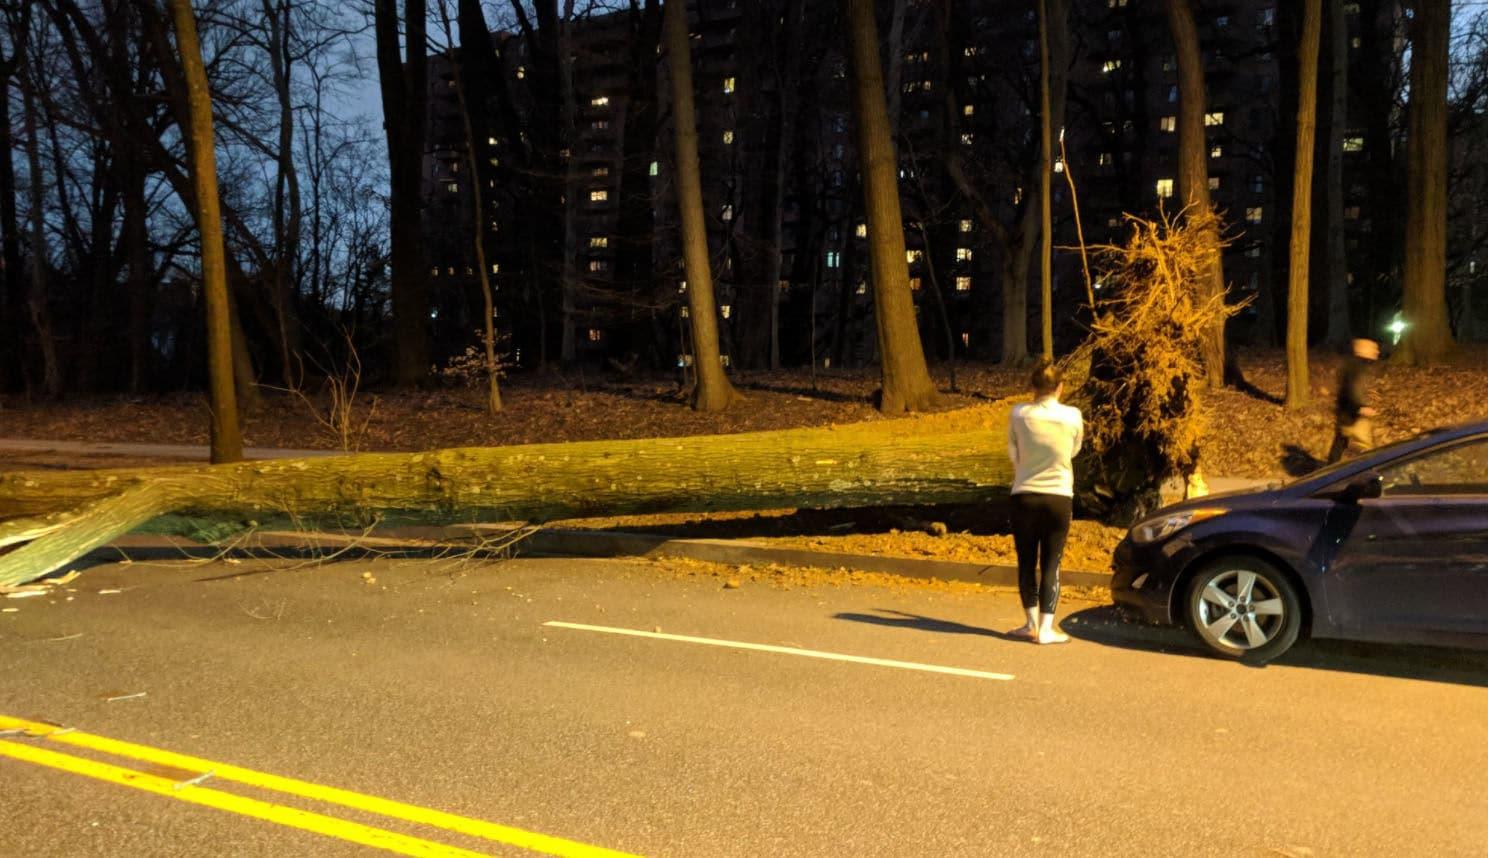 A fallen tree blocks the area of the 4200 block of Massachusetts Avenue in Northwest D.C. on Friday, March 2, 2018. (WTOP/Brandon Millman)